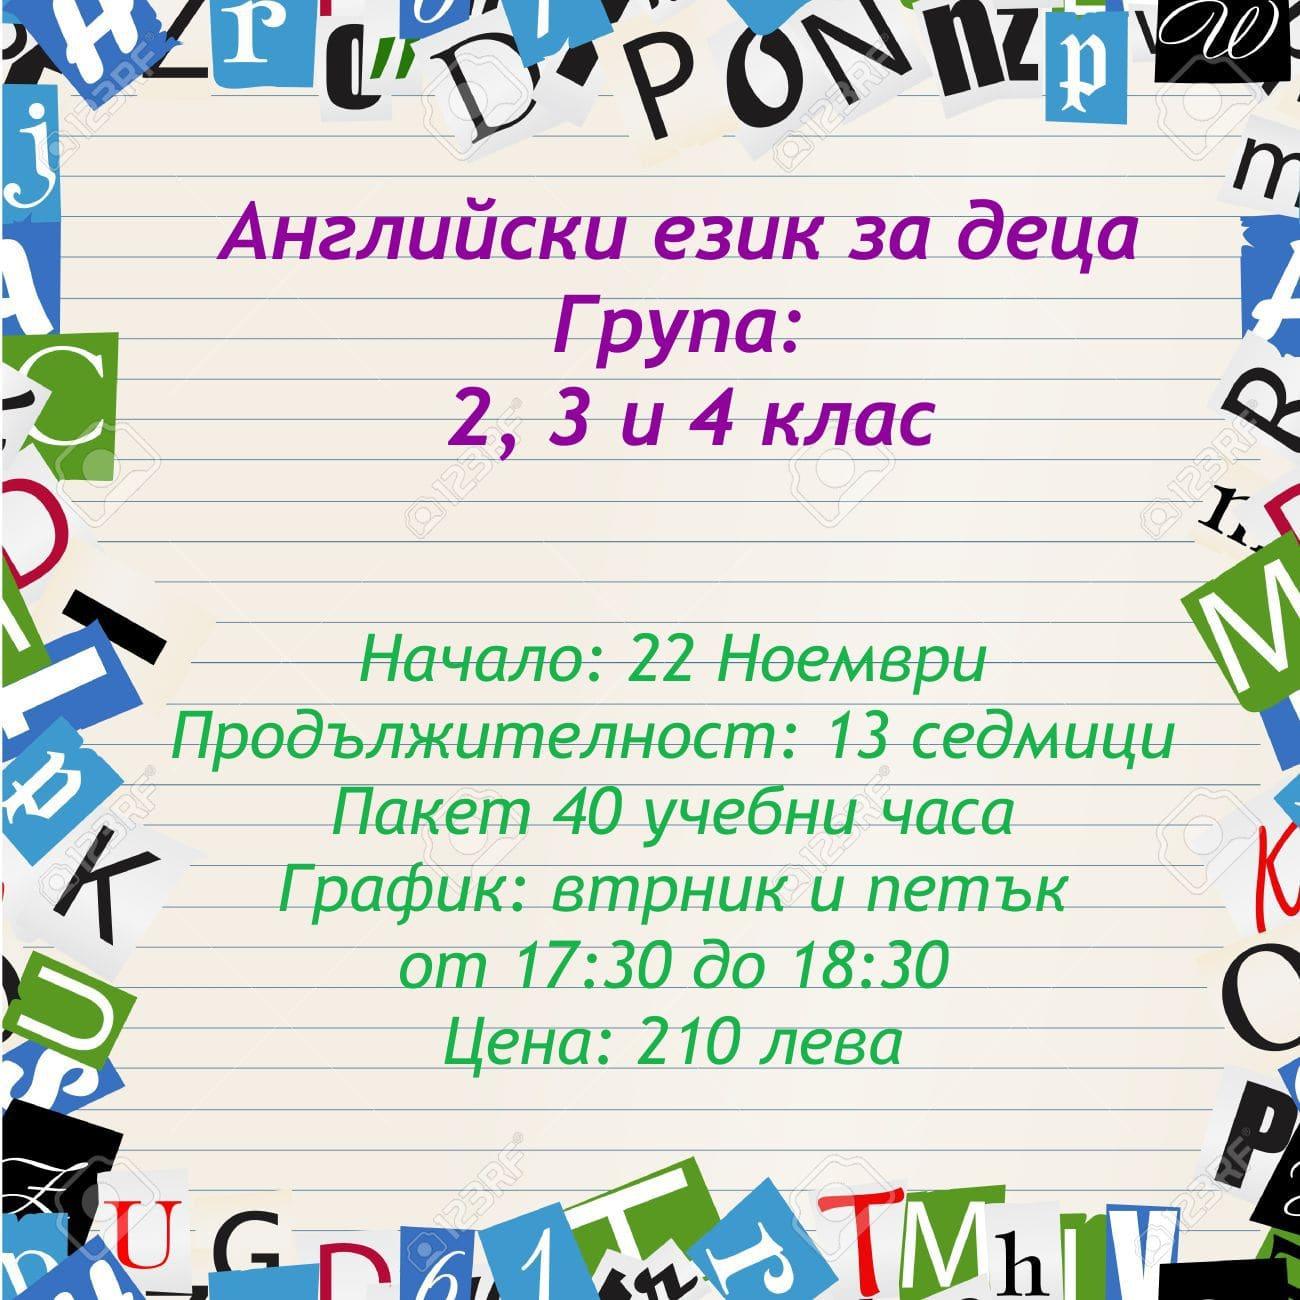 Английски език за деца - 2, 3 и 4 клас